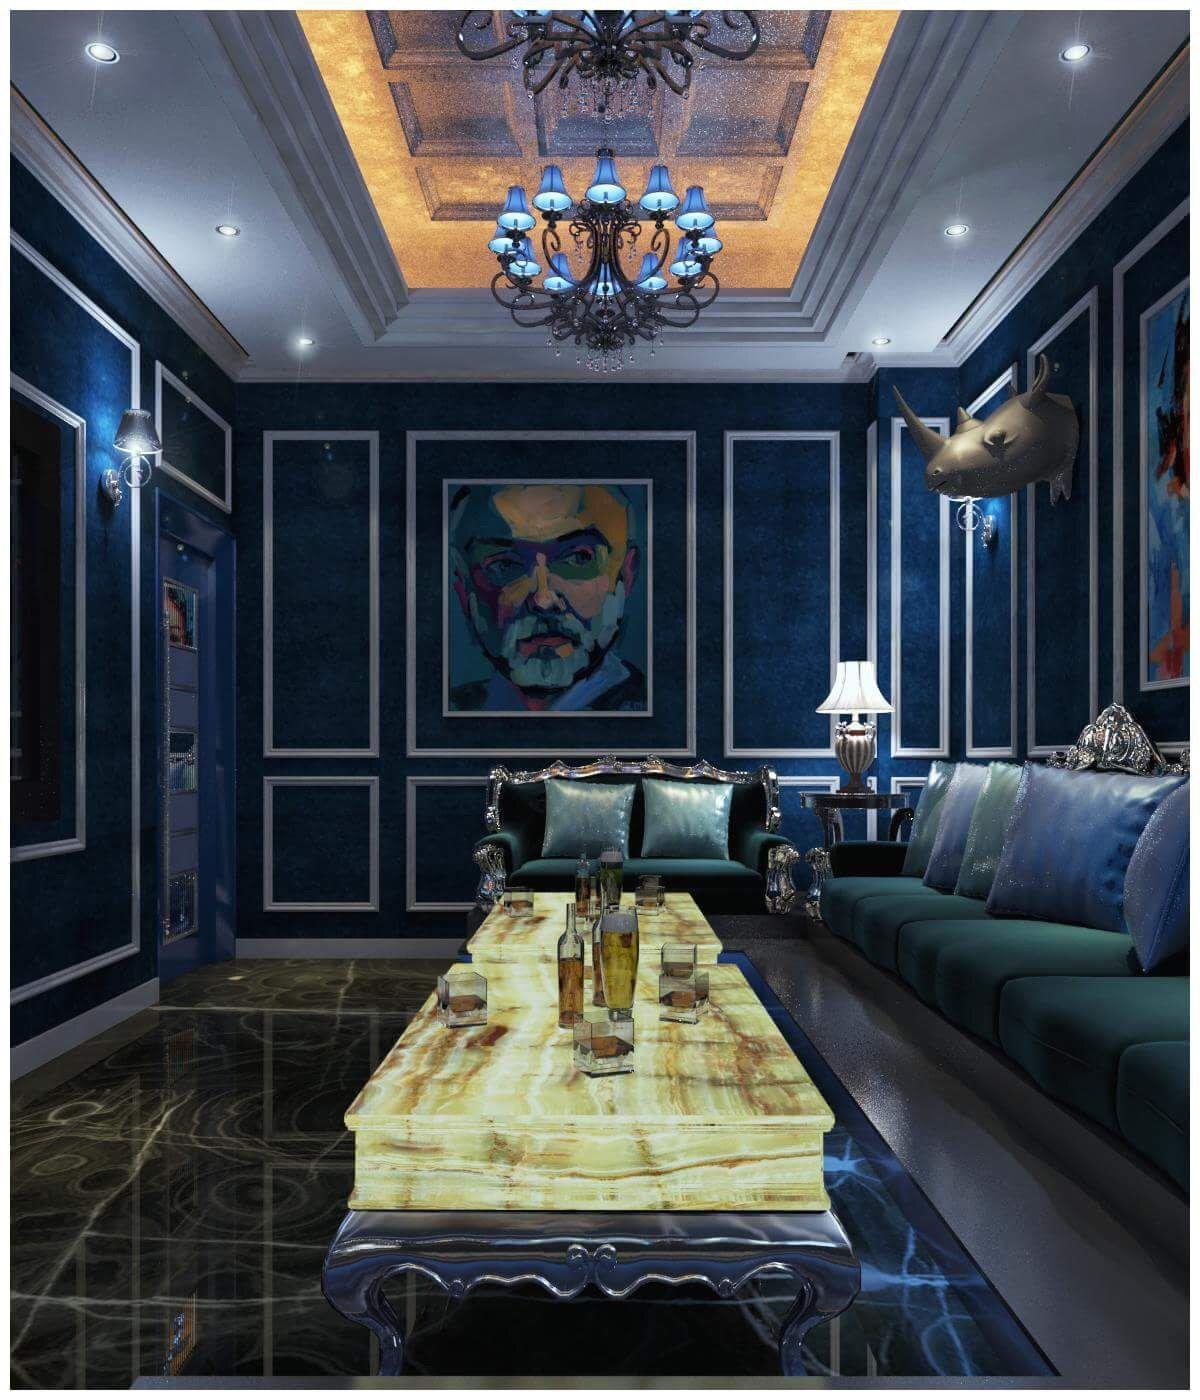 Semicircular Ktv Room Interior Design: Home Cinema Room, Karaoke Room